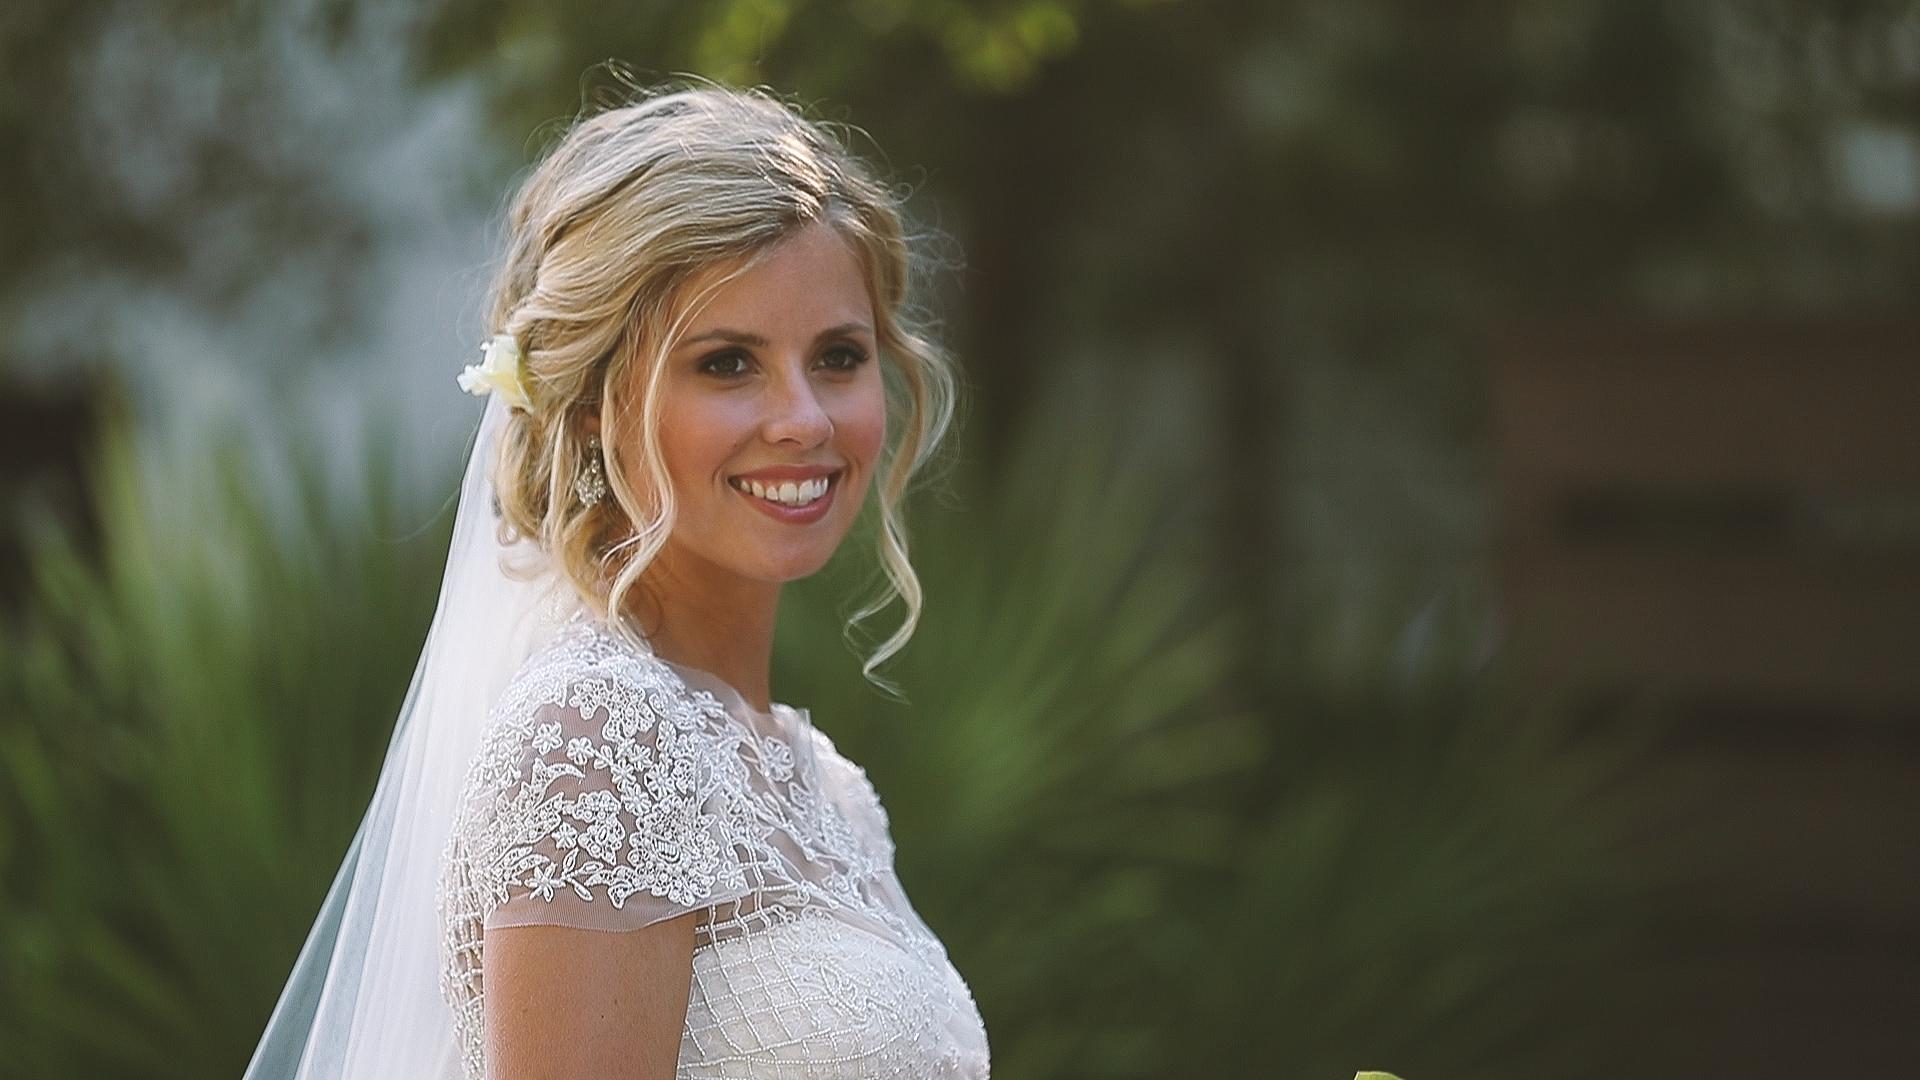 Rosemary Beach Wedding - Bride Film